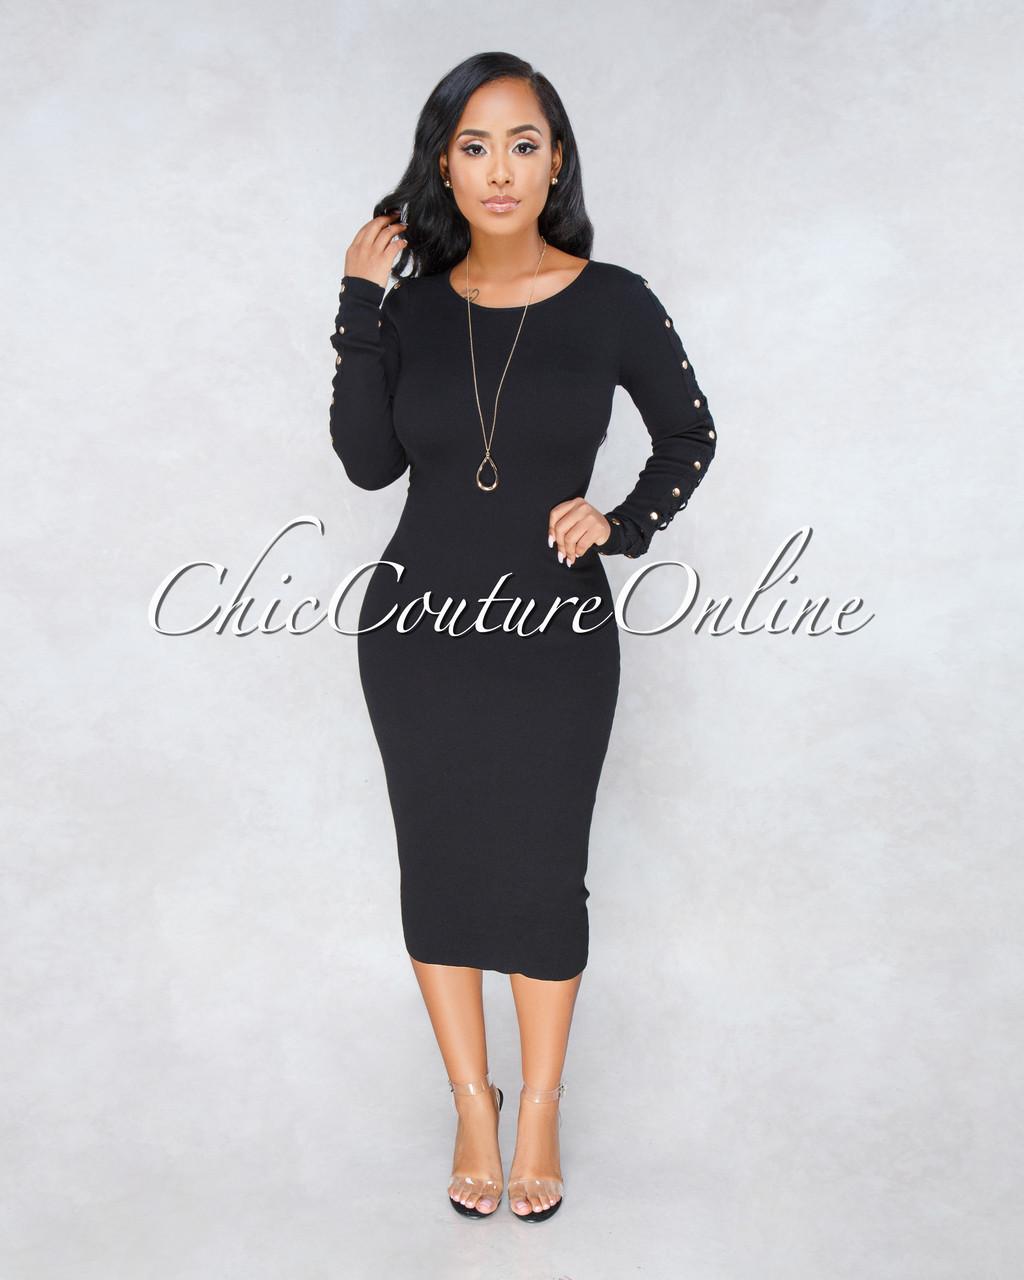 1c67dd15f09dd Jazly Black Knit Lattice Gold Buttons Sleeves Midi Dress. Price: $60.00.  Image 1